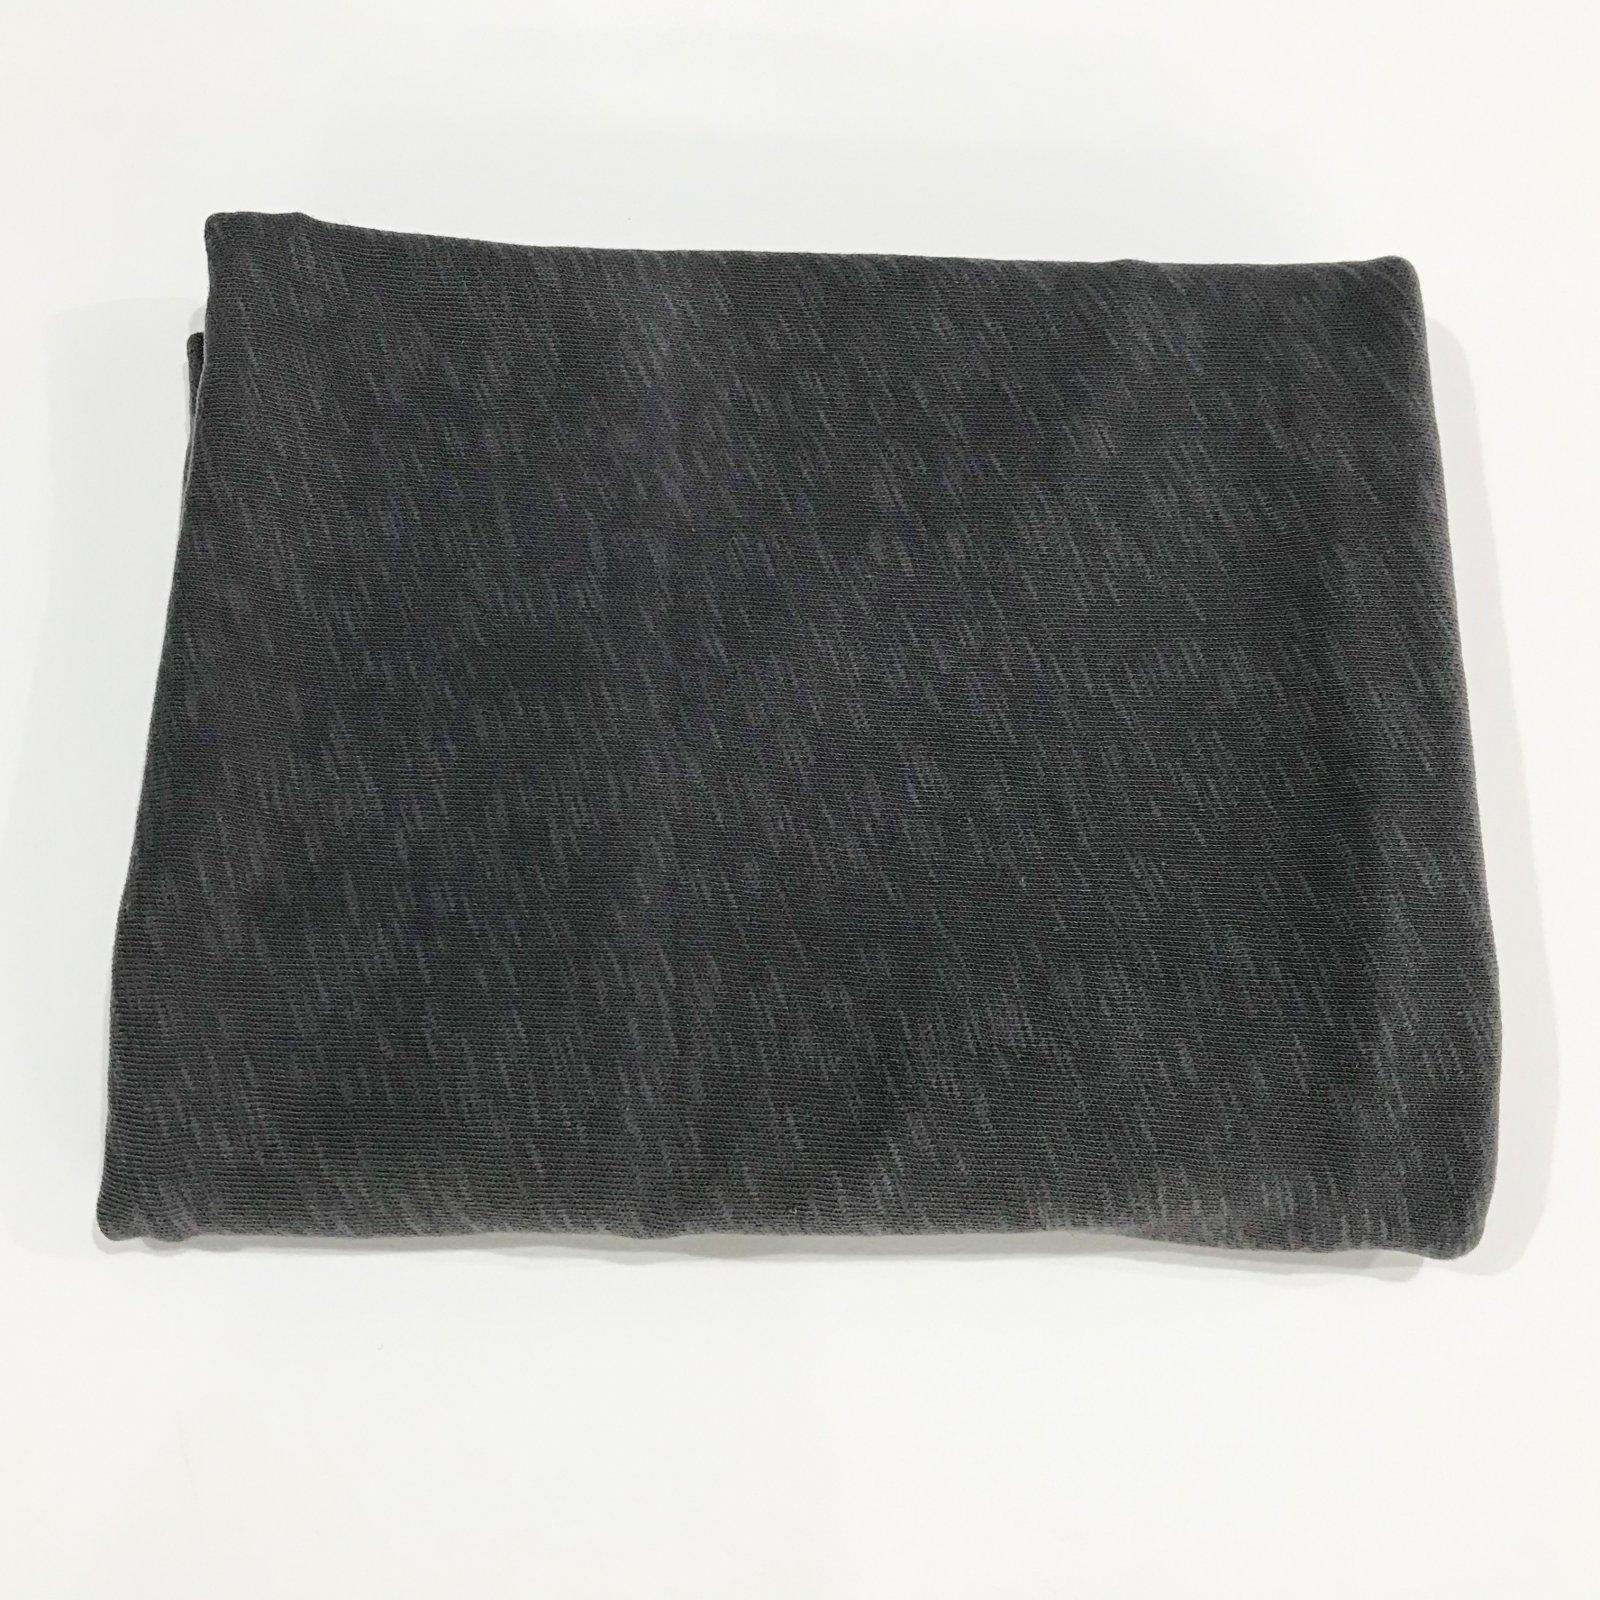 1 yard + 11 inches - Cotton Sweater Slub Knit - Charcoal